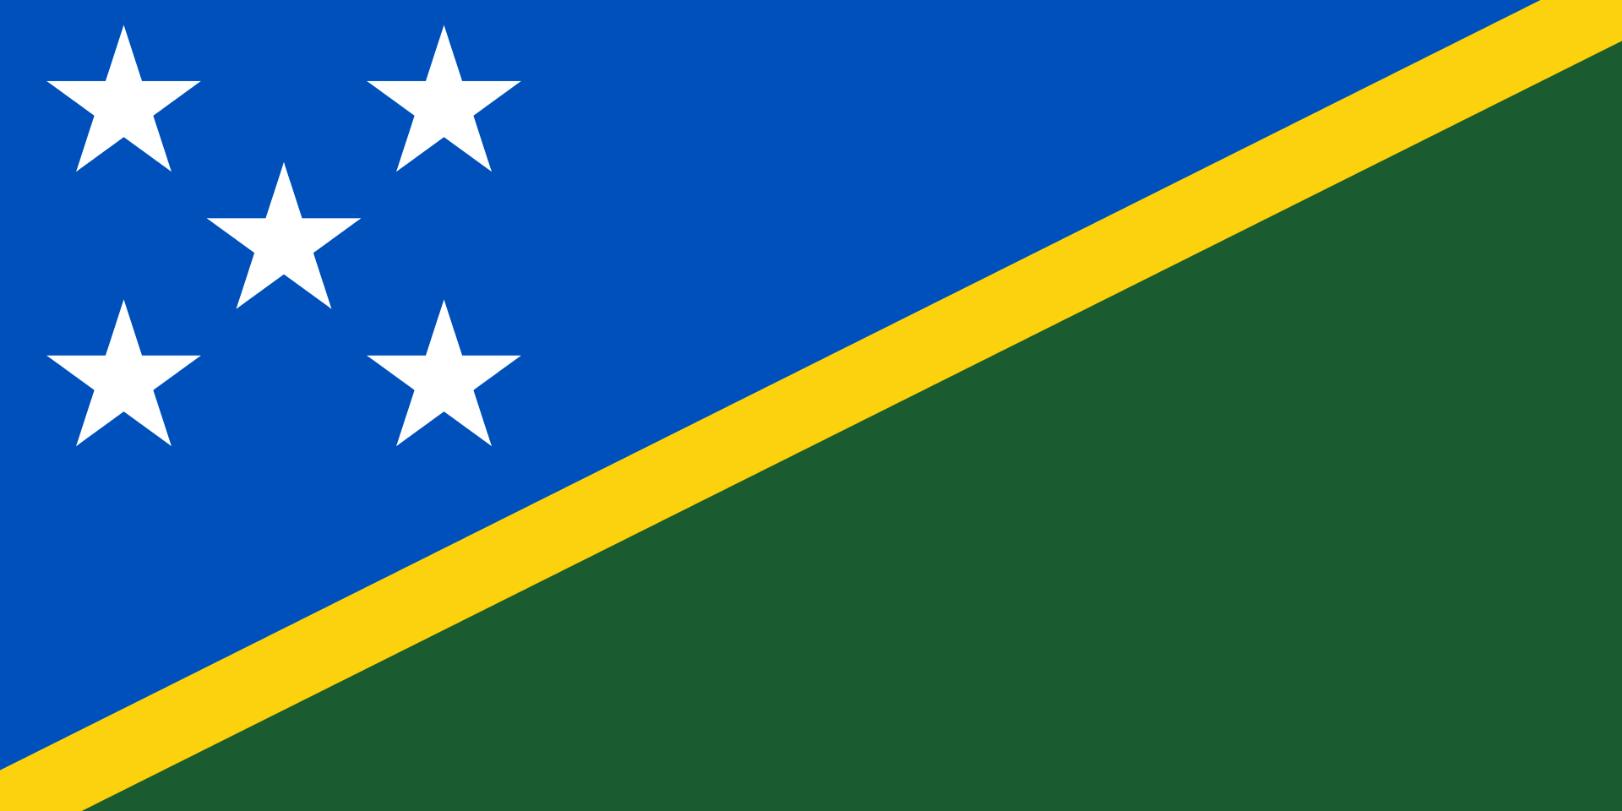 Flagge im Querformat Land Salomonen 150x100 cm